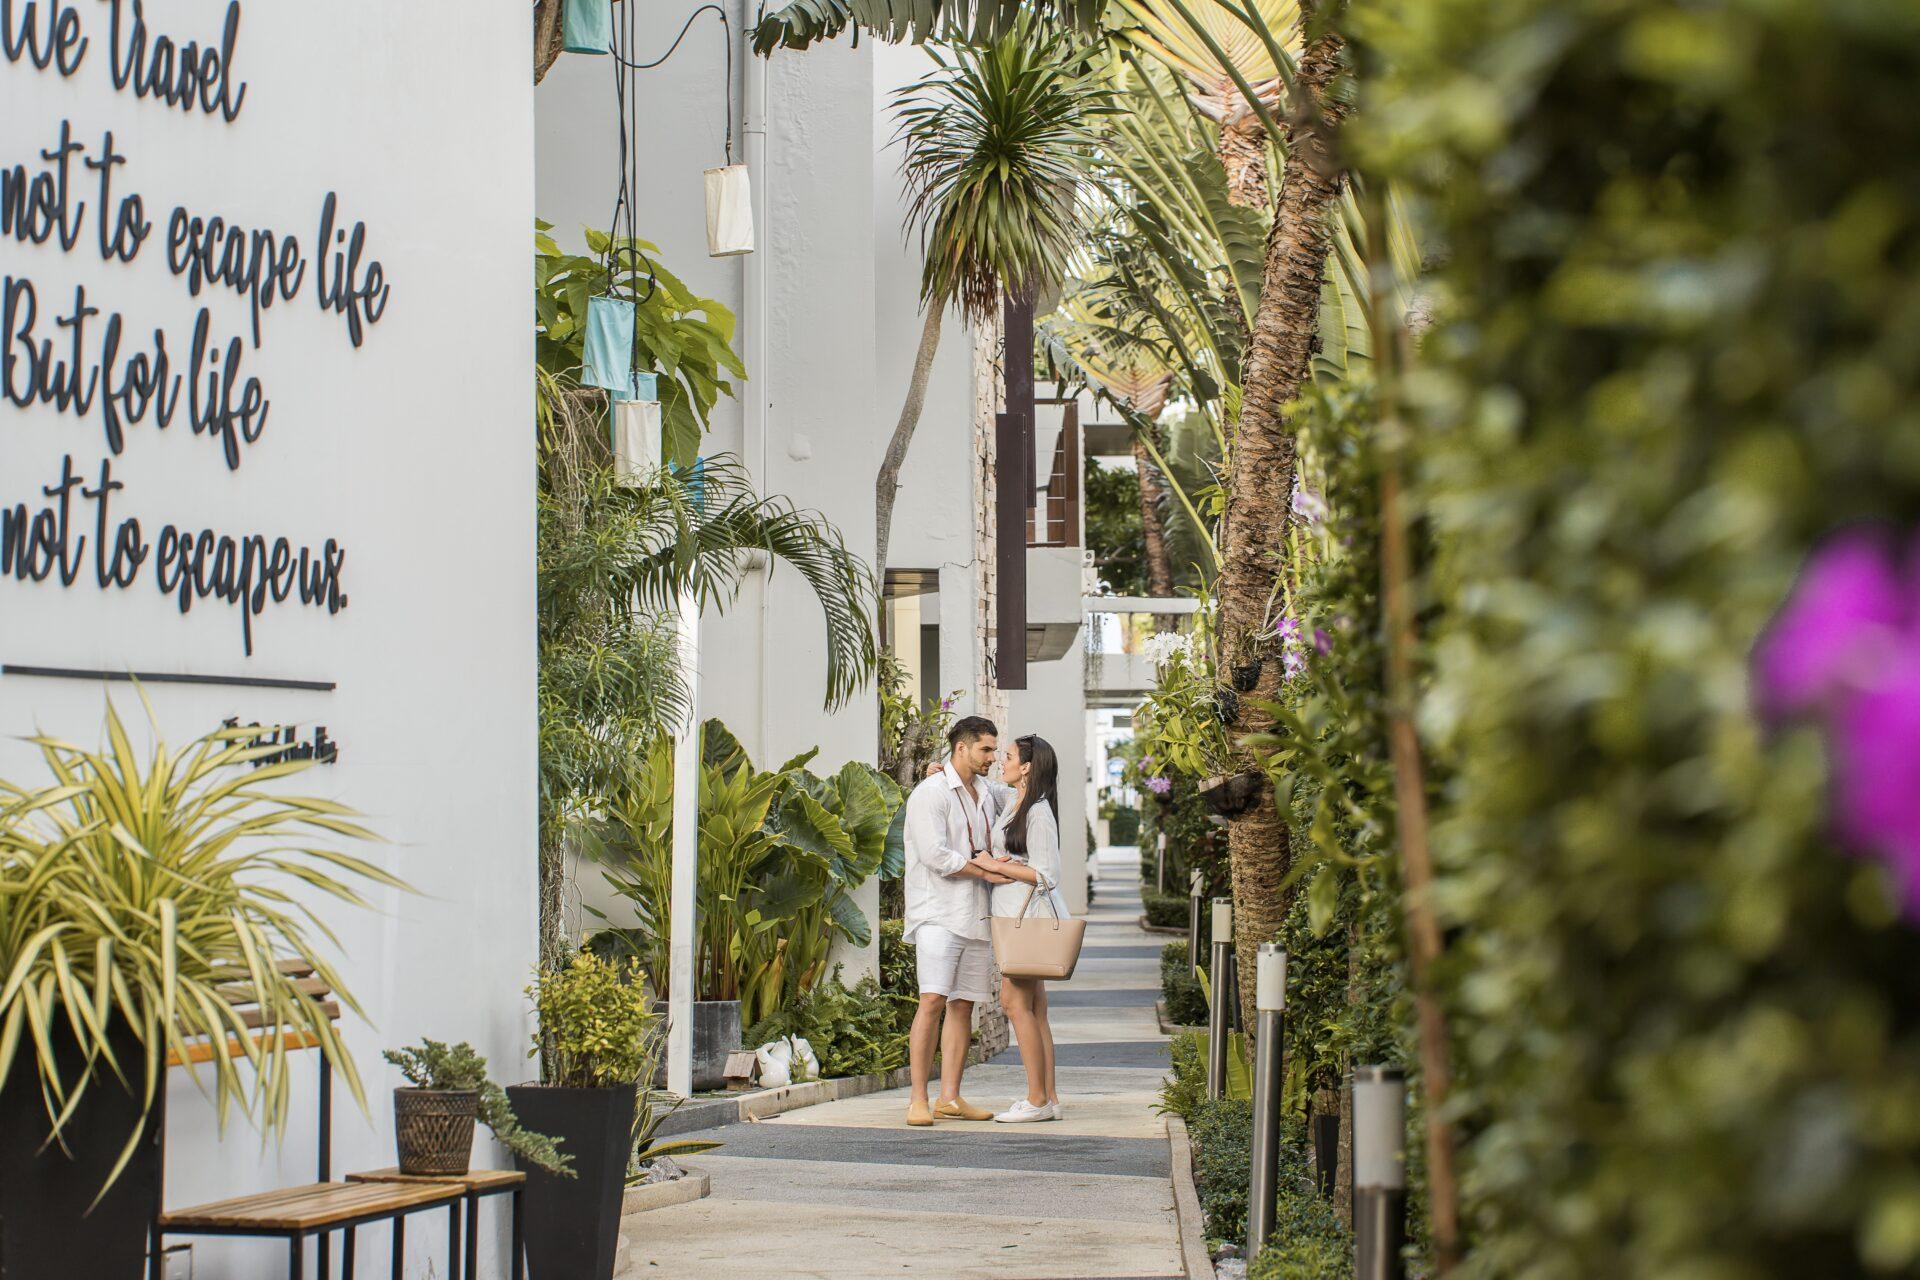 hua-hin the-rock resort hotel beach seaview pool villas